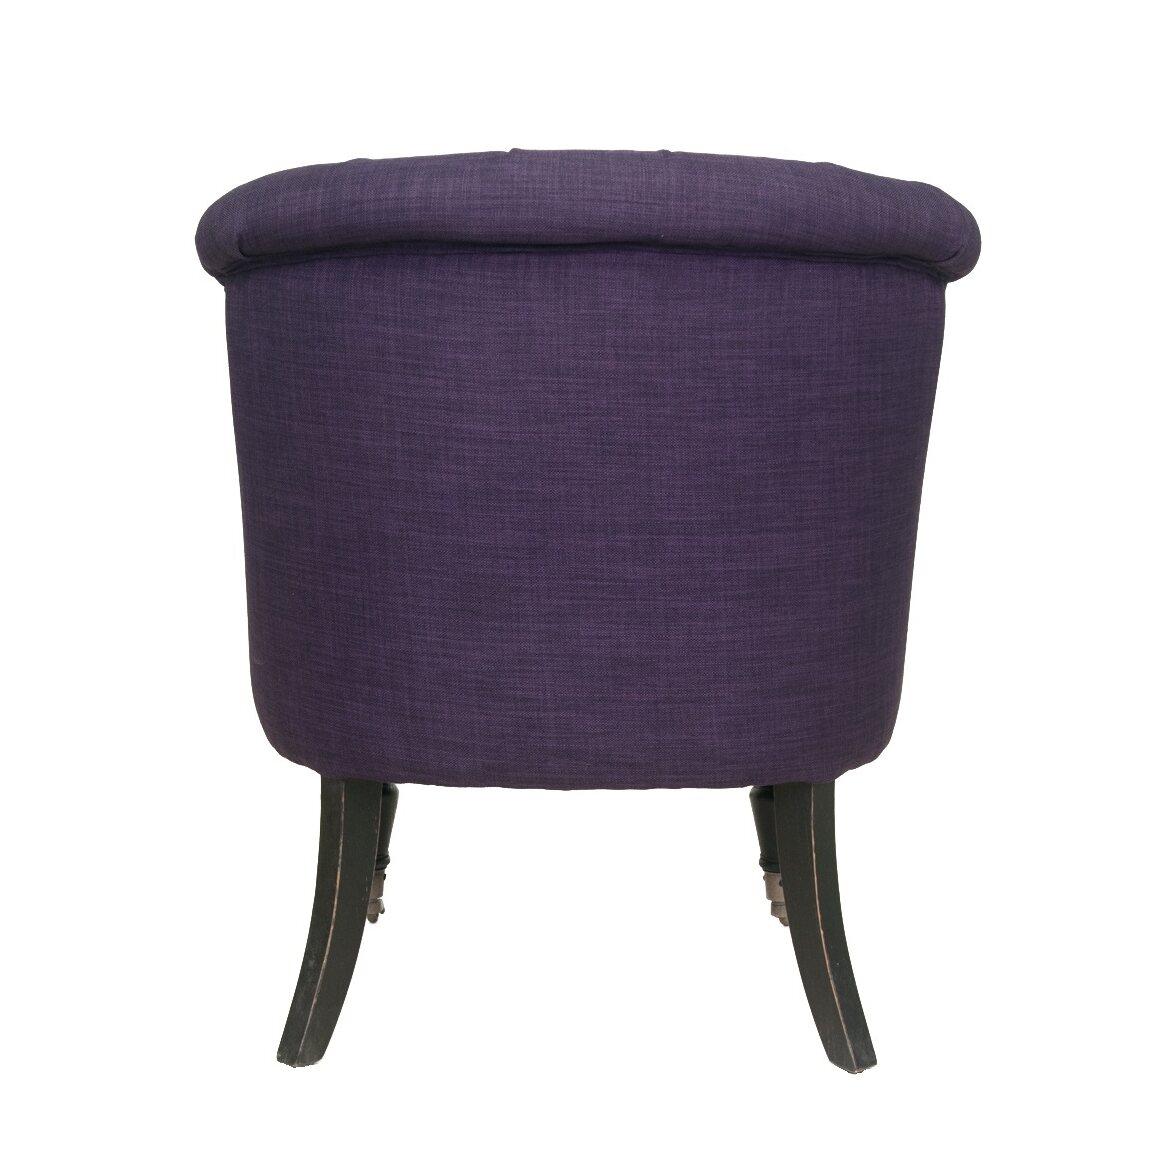 Низкое кресло Aviana purple 3   Маленькие кресла Kingsby